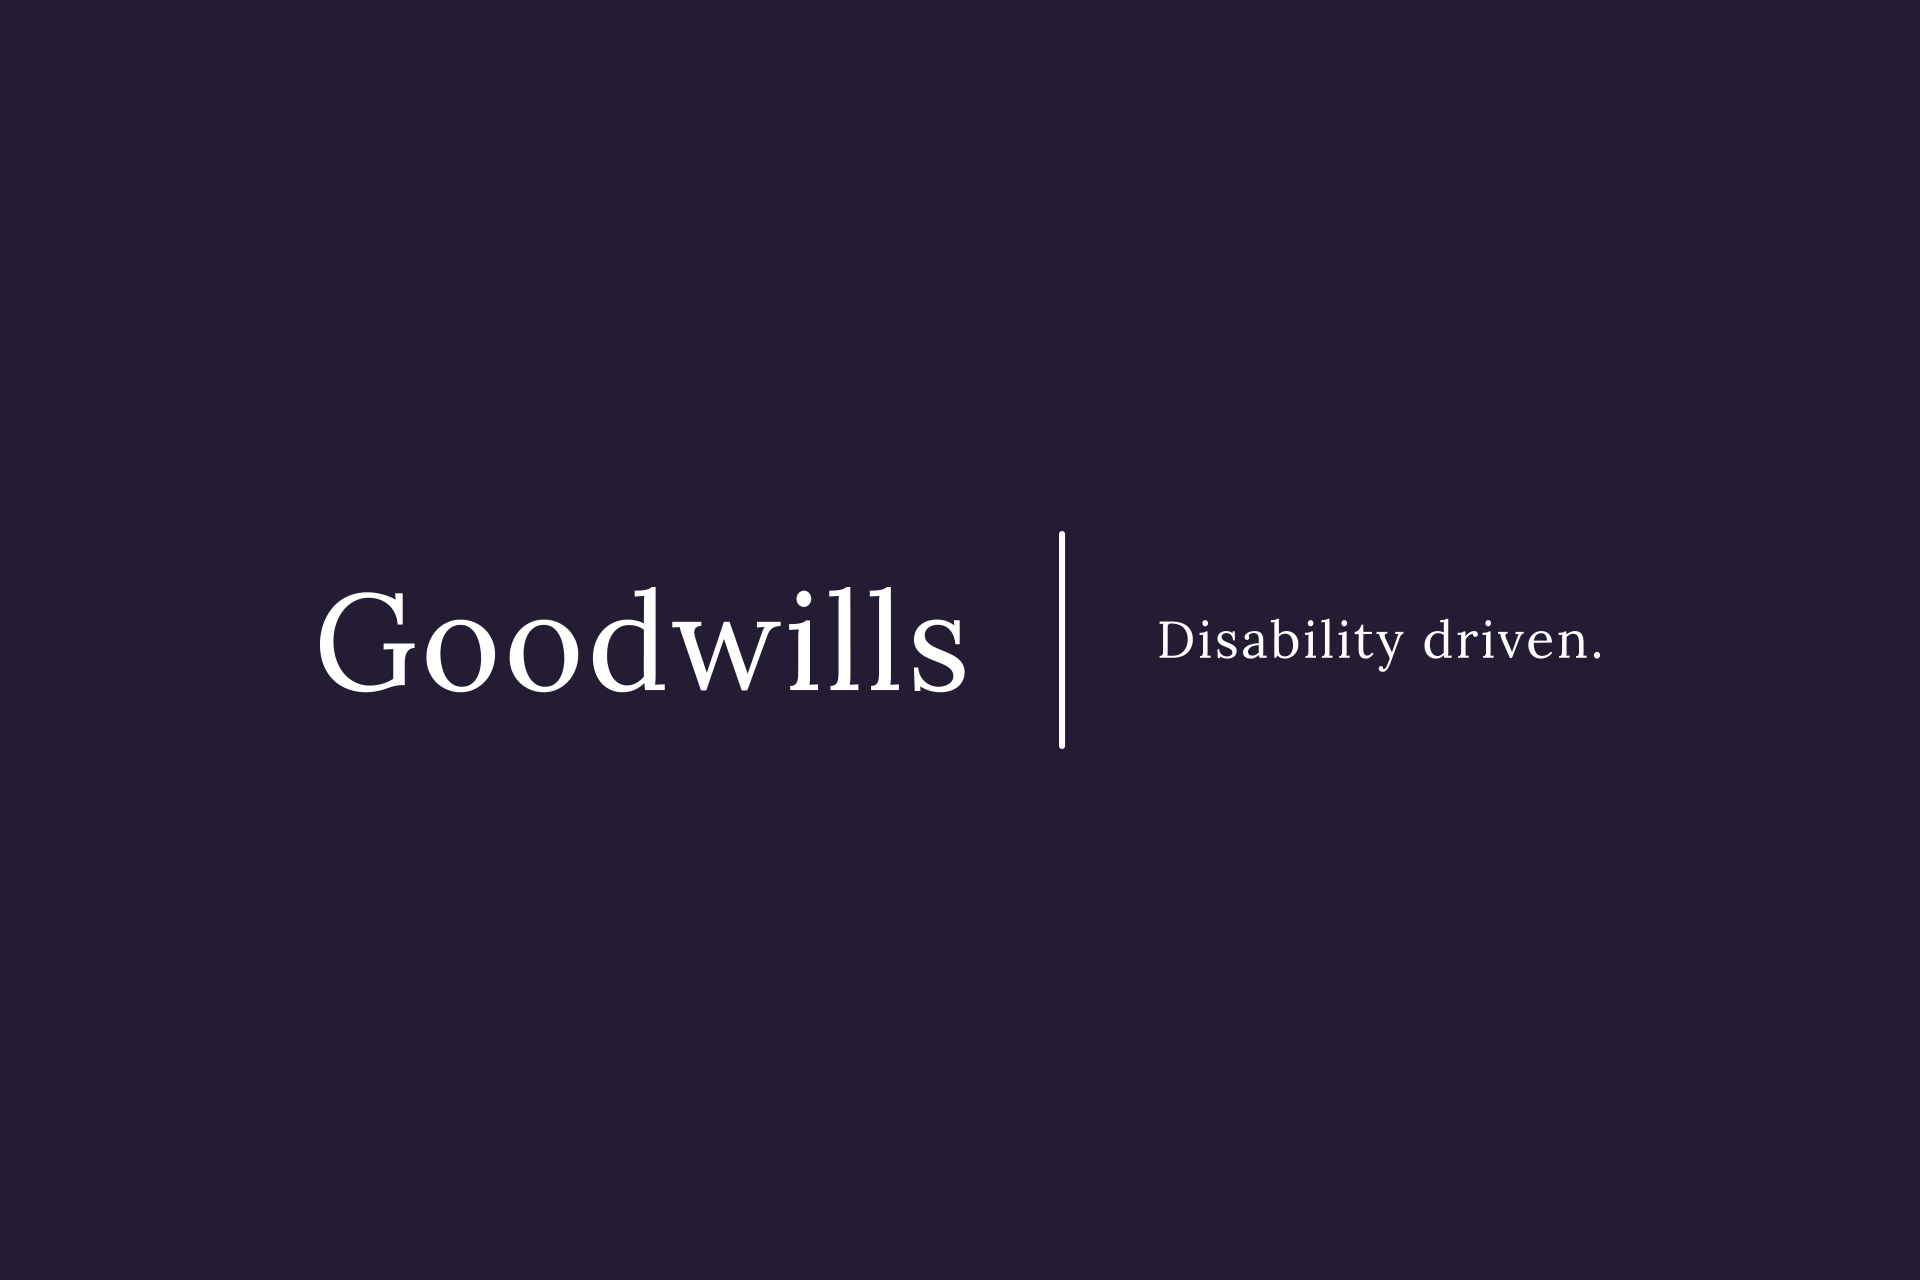 Goodwills